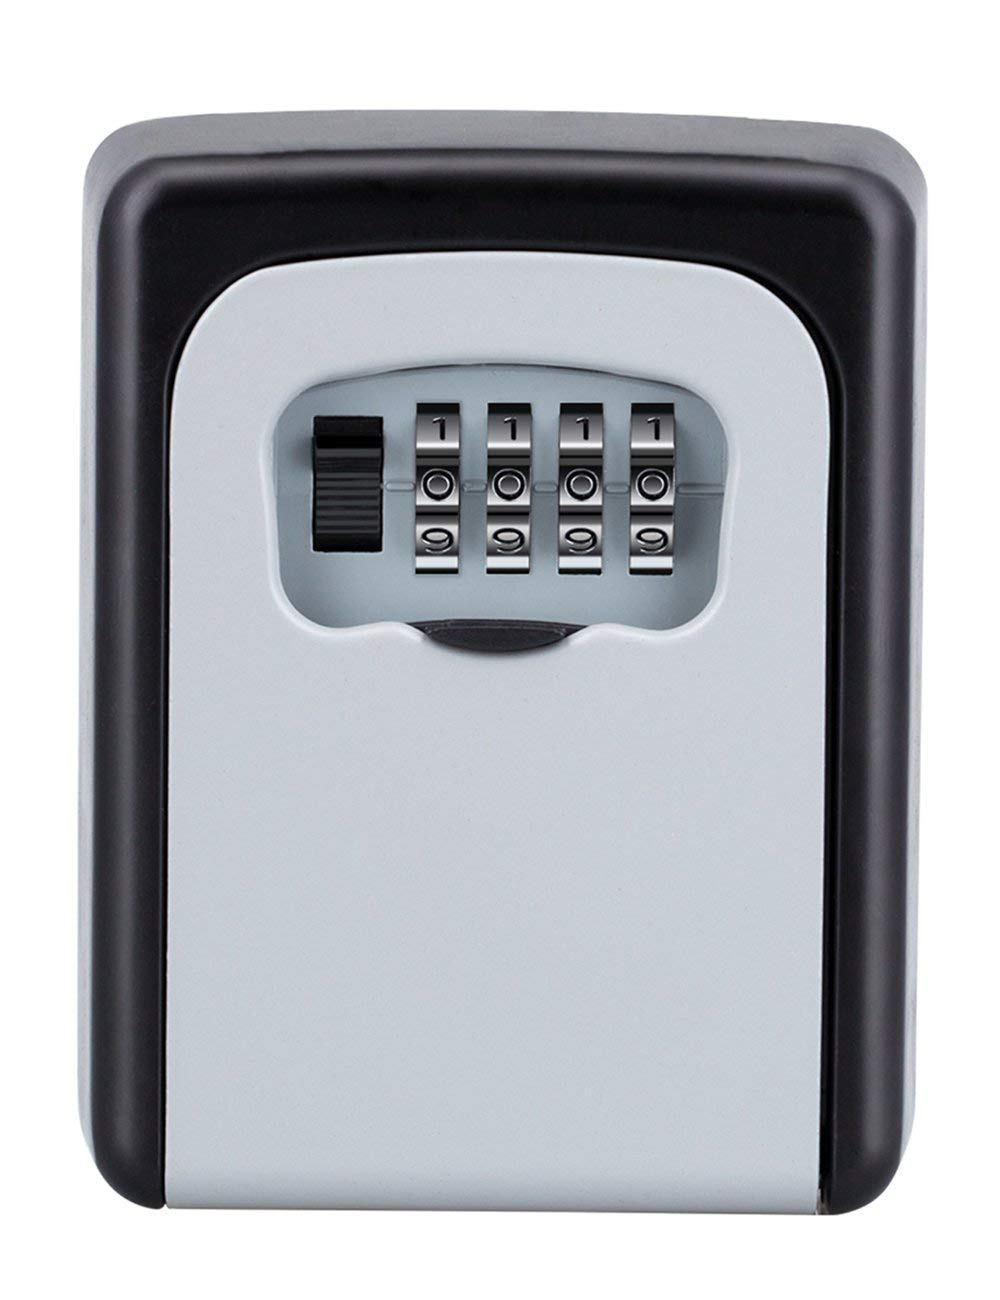 e33803b40353 Cheap Spare Key Lock Box, find Spare Key Lock Box deals on line at ...